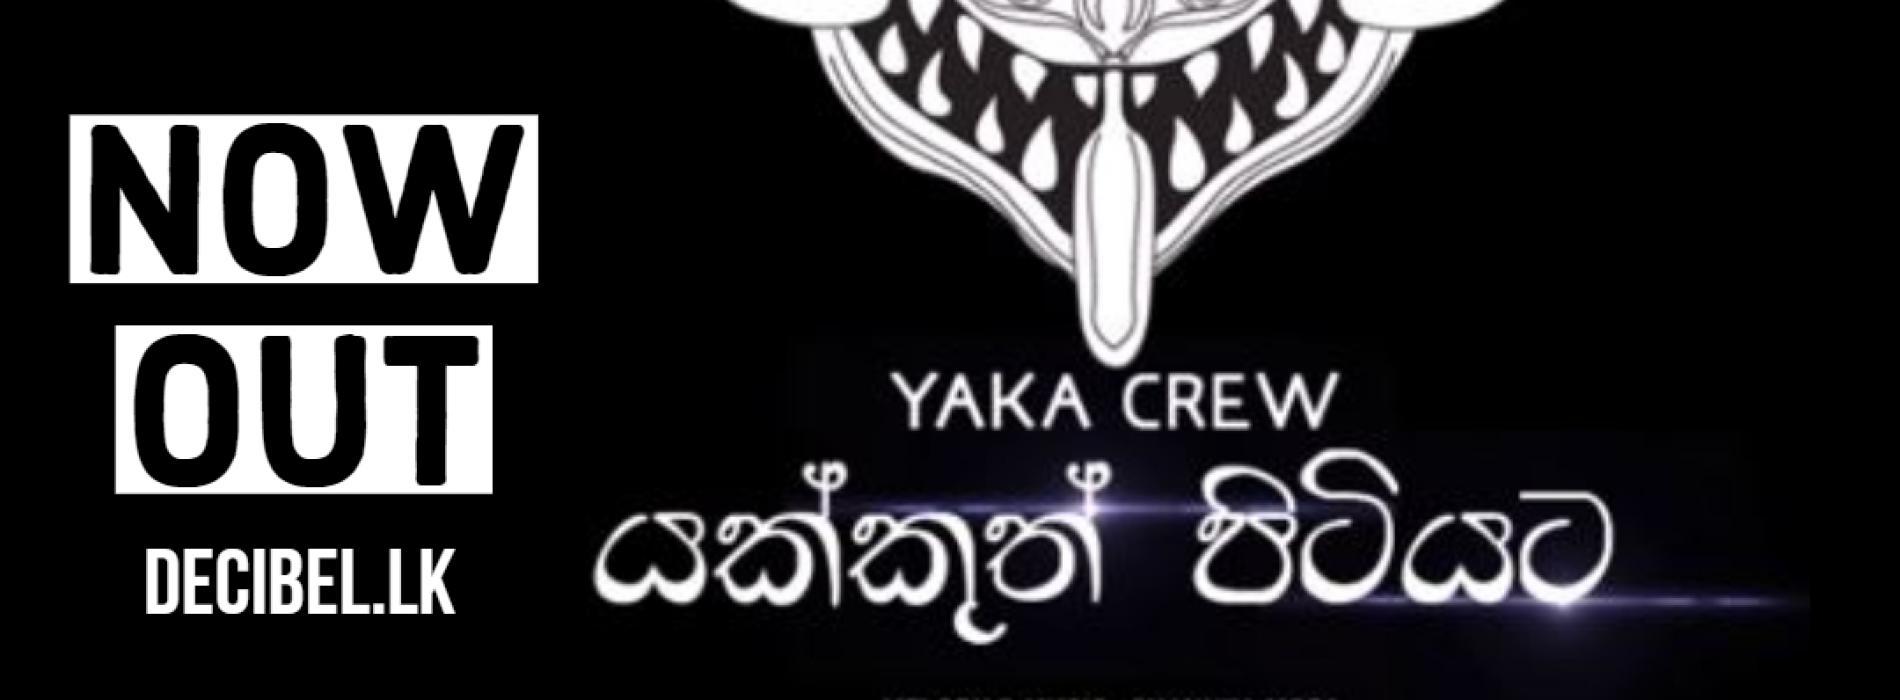 Yaka Crew – Yakkuth Pitiyata (යක්කුත් පිටියට)